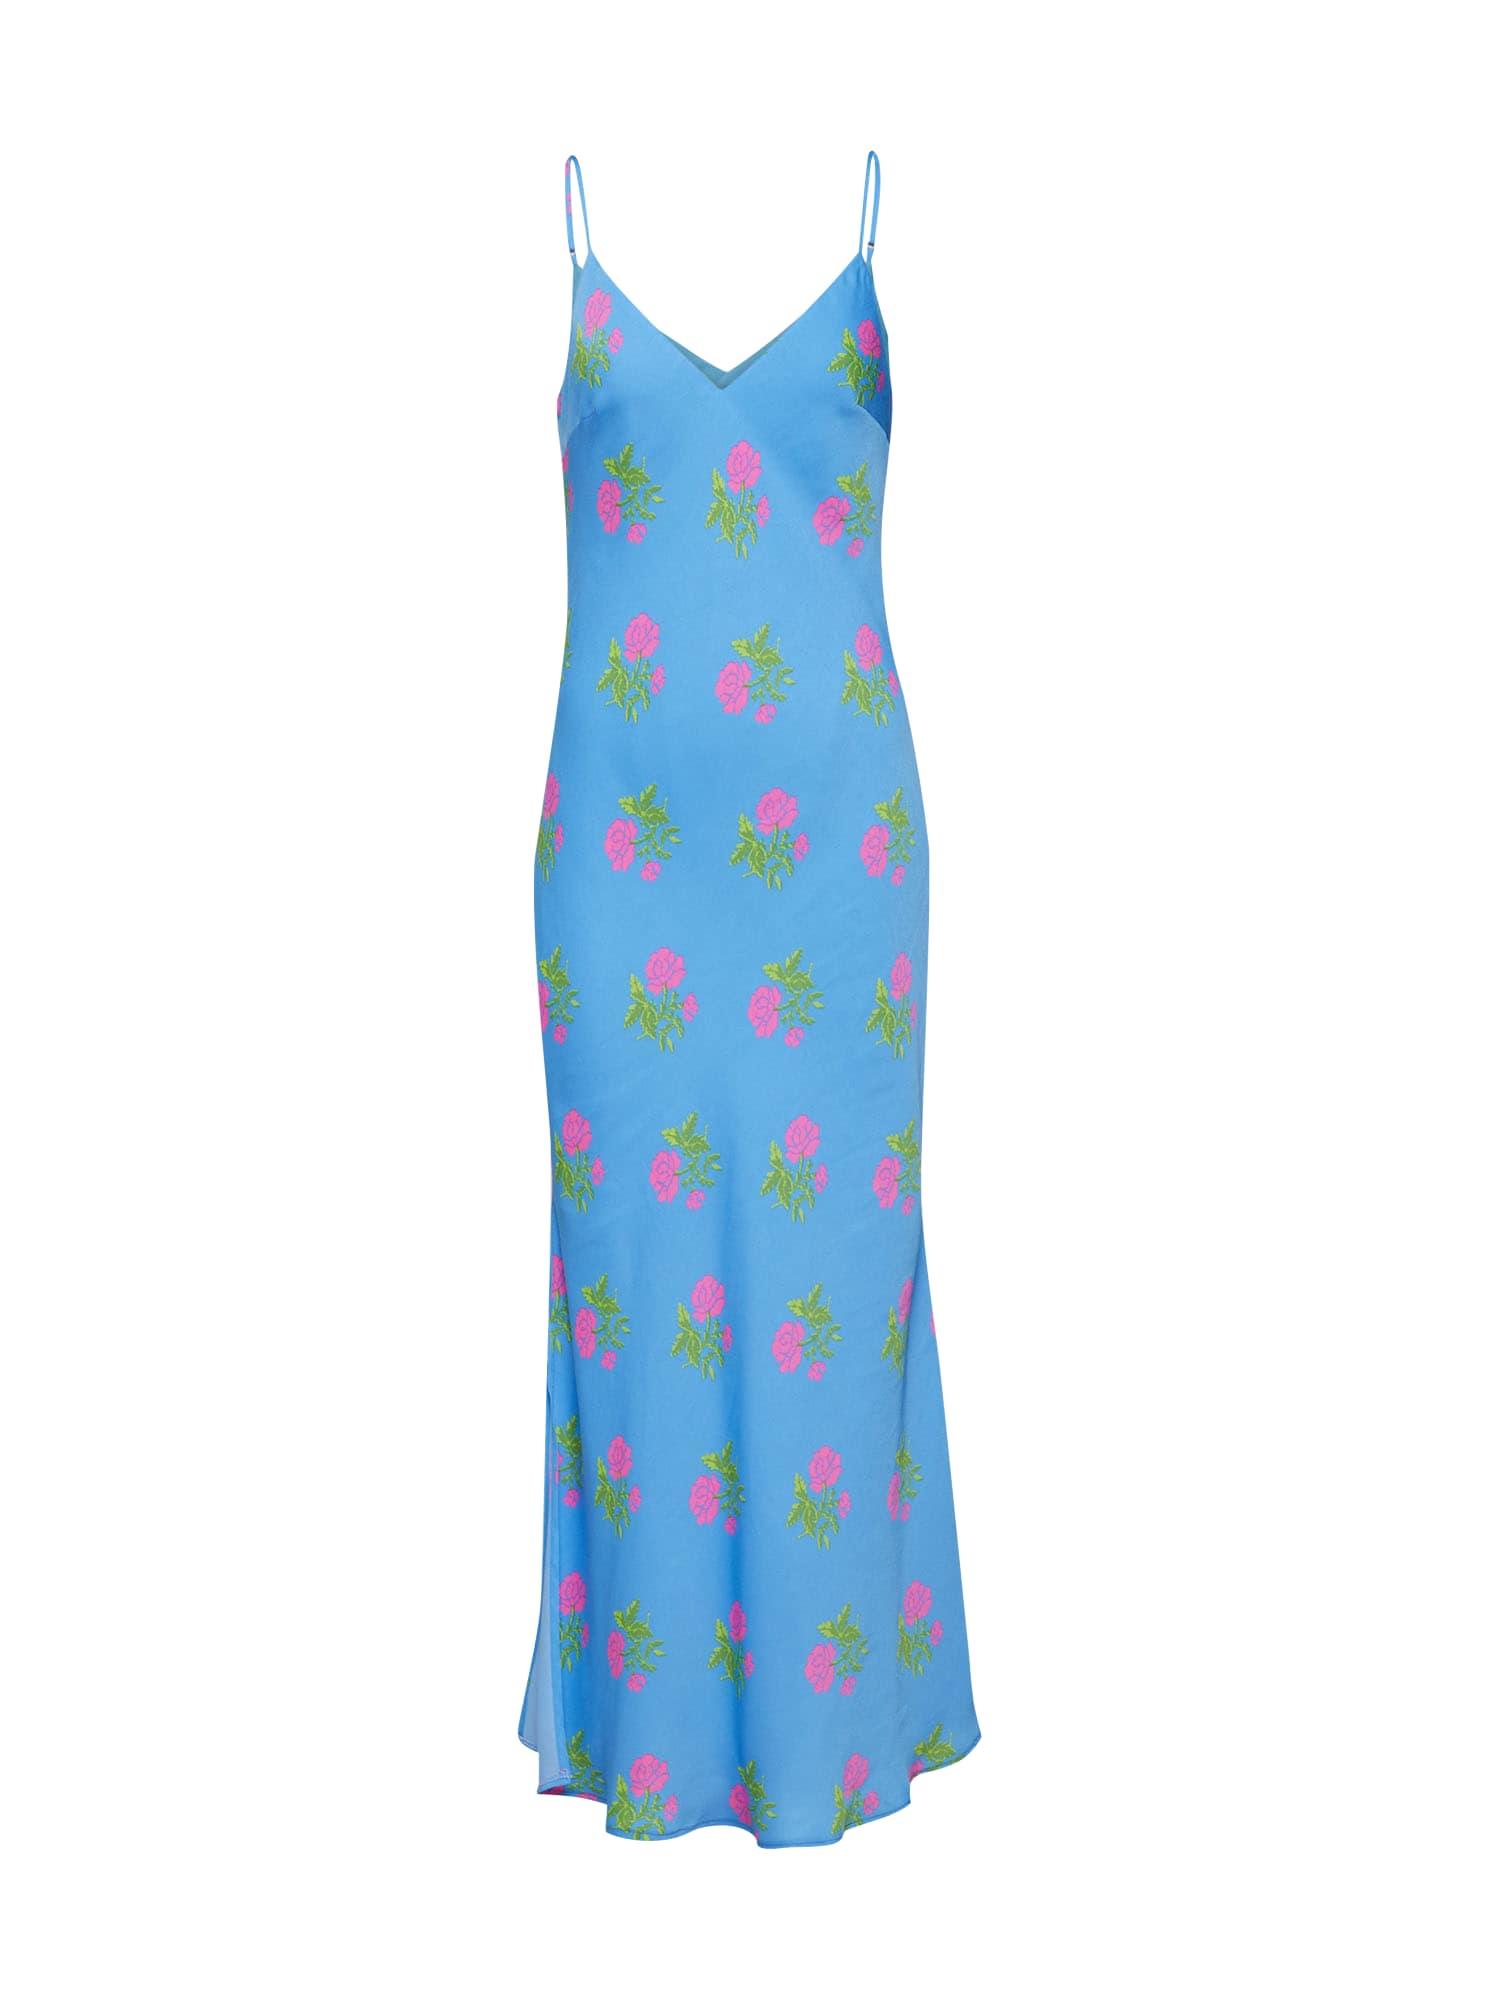 Letní šaty Serenity modrá Essentiel Antwerp